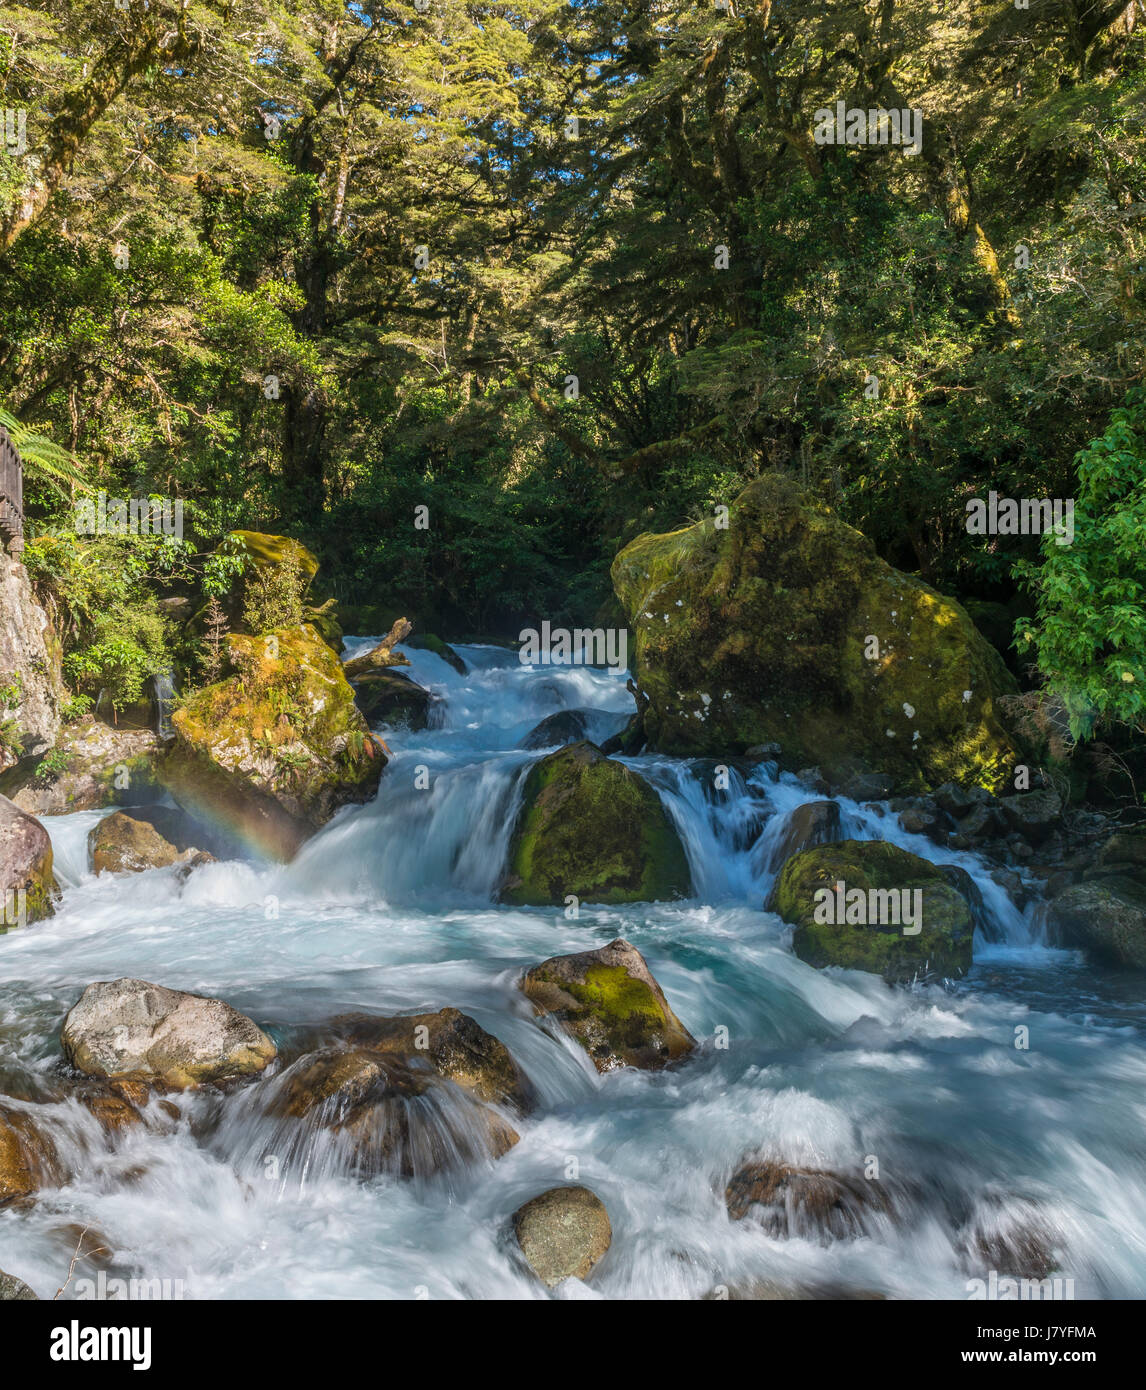 Fluss durch üppige Vegetation, gemäßigten Regenwald, Fiordland-Nationalpark, Southland, Neuseeland Stockbild